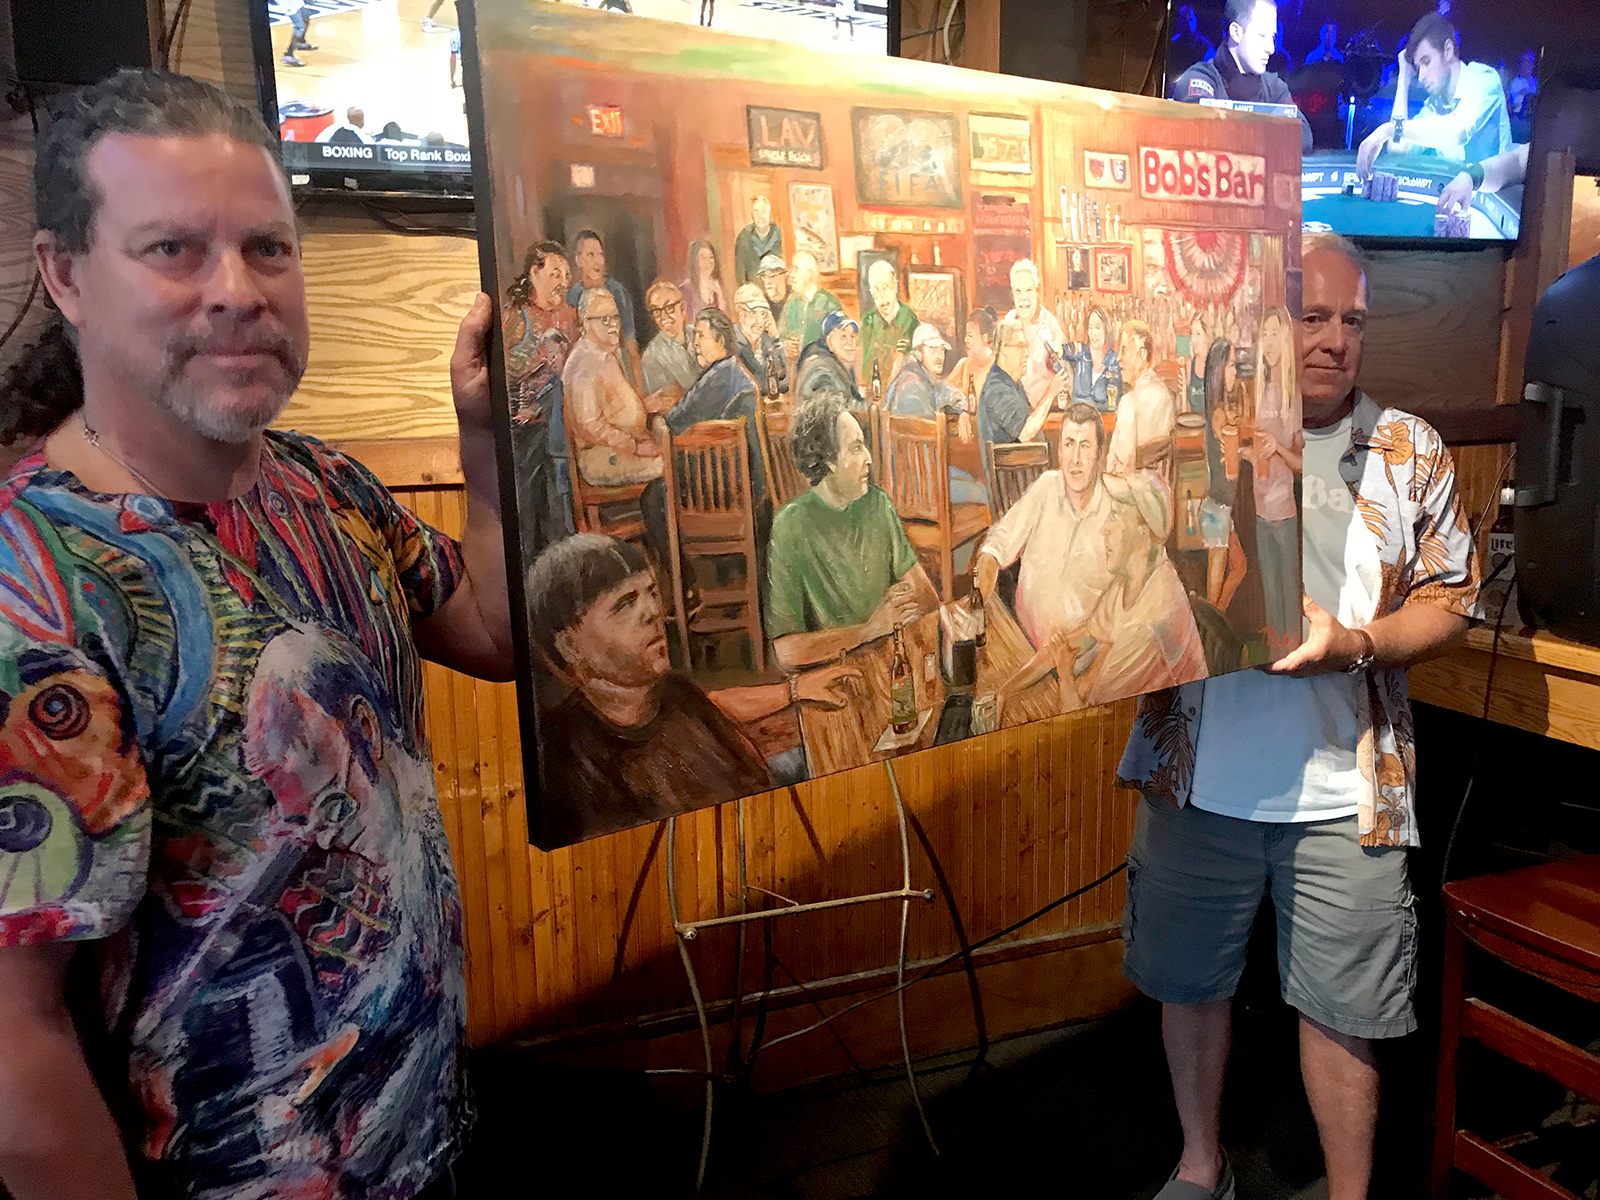 """The Cronies at Bobs Bar"", Grand Rapids, Michigan"